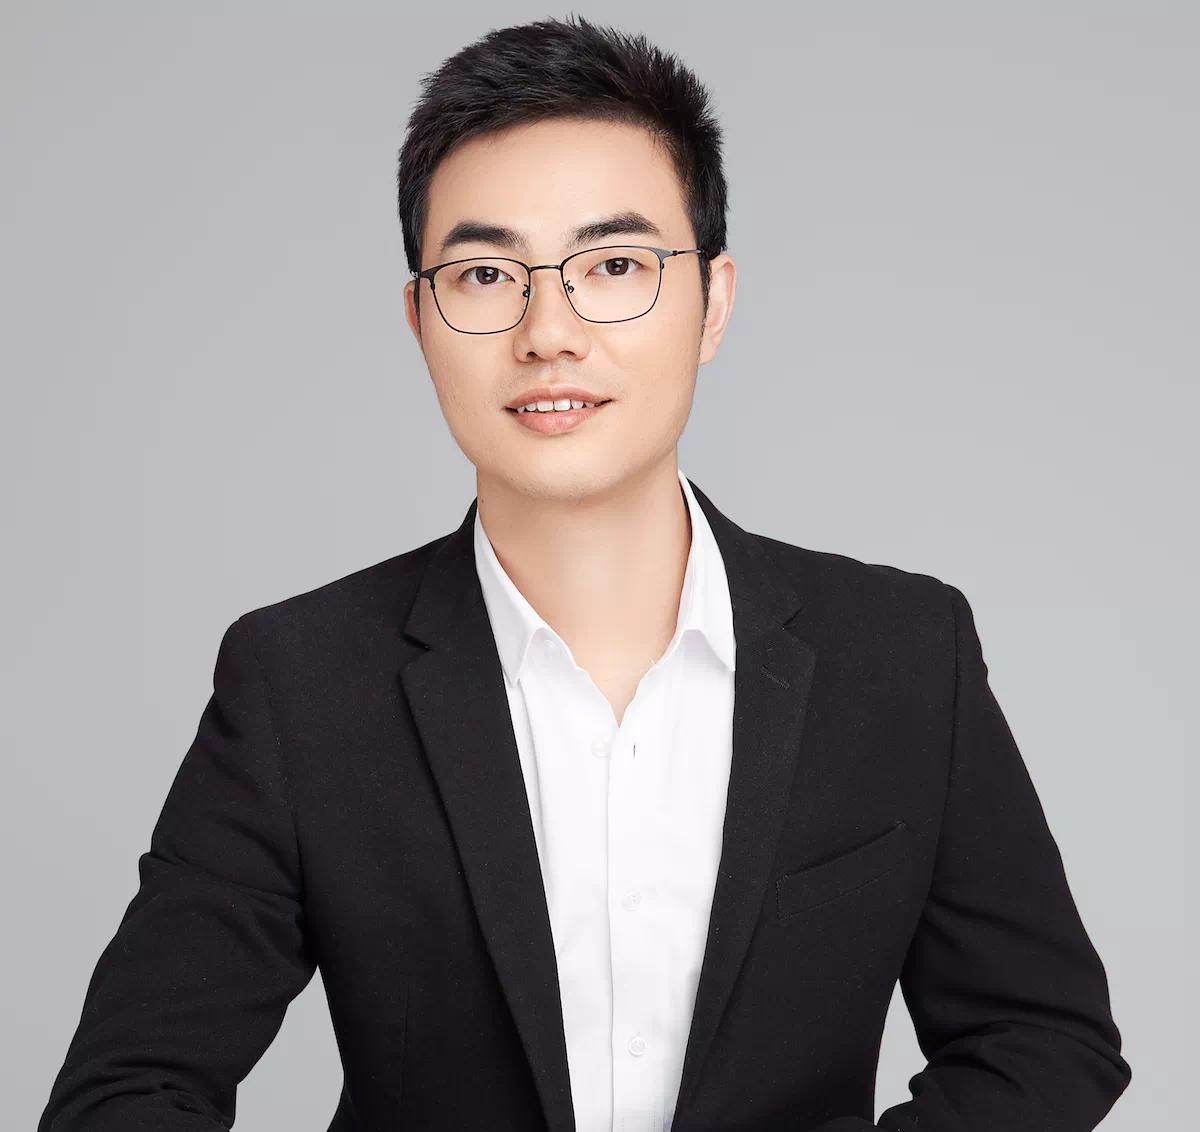 Wei Jin